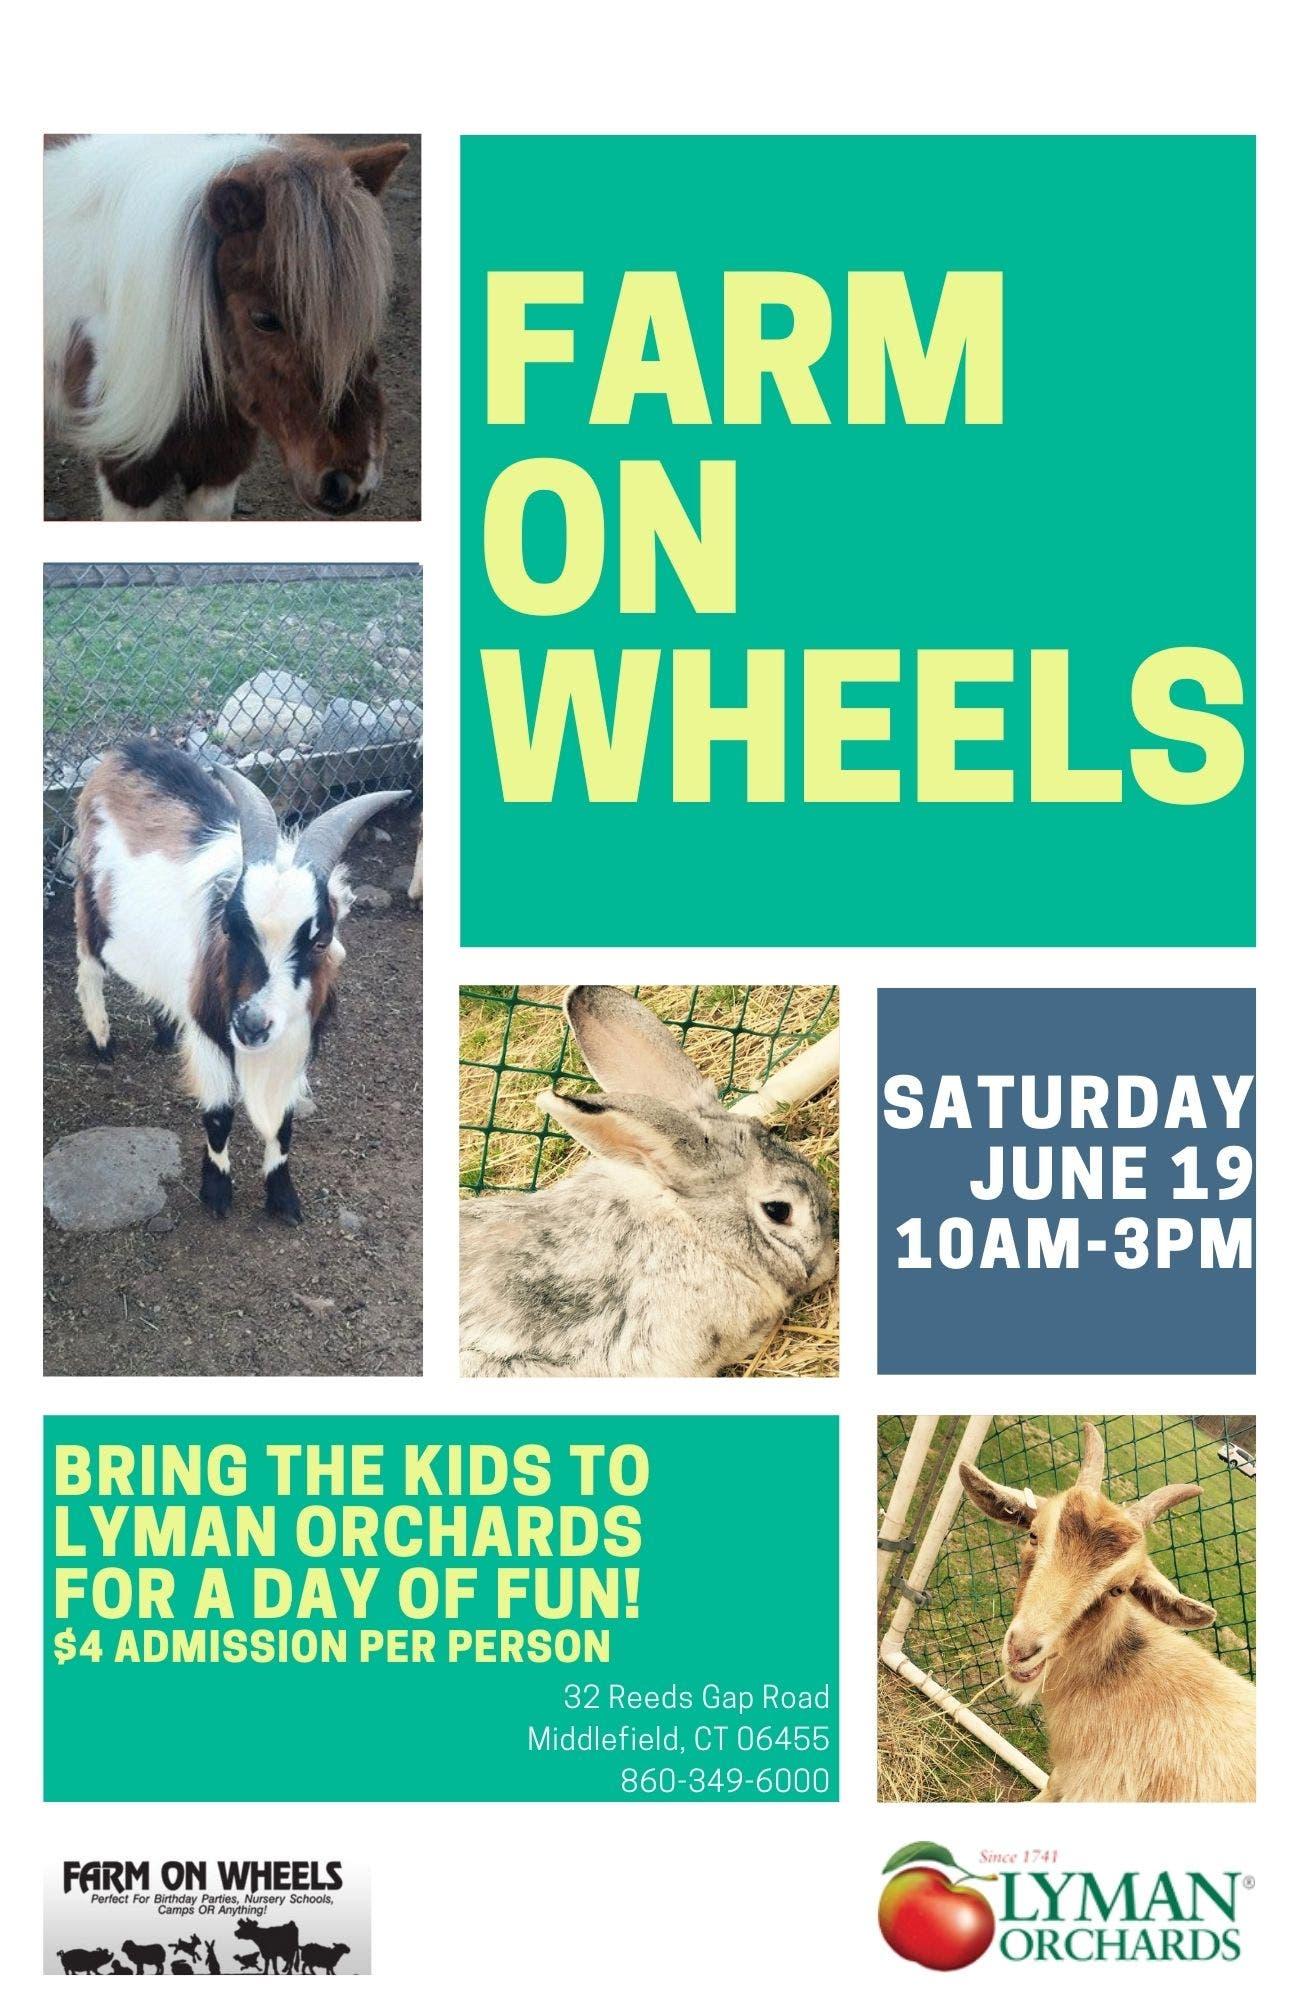 Farm on Wheels at Lyman Orchards